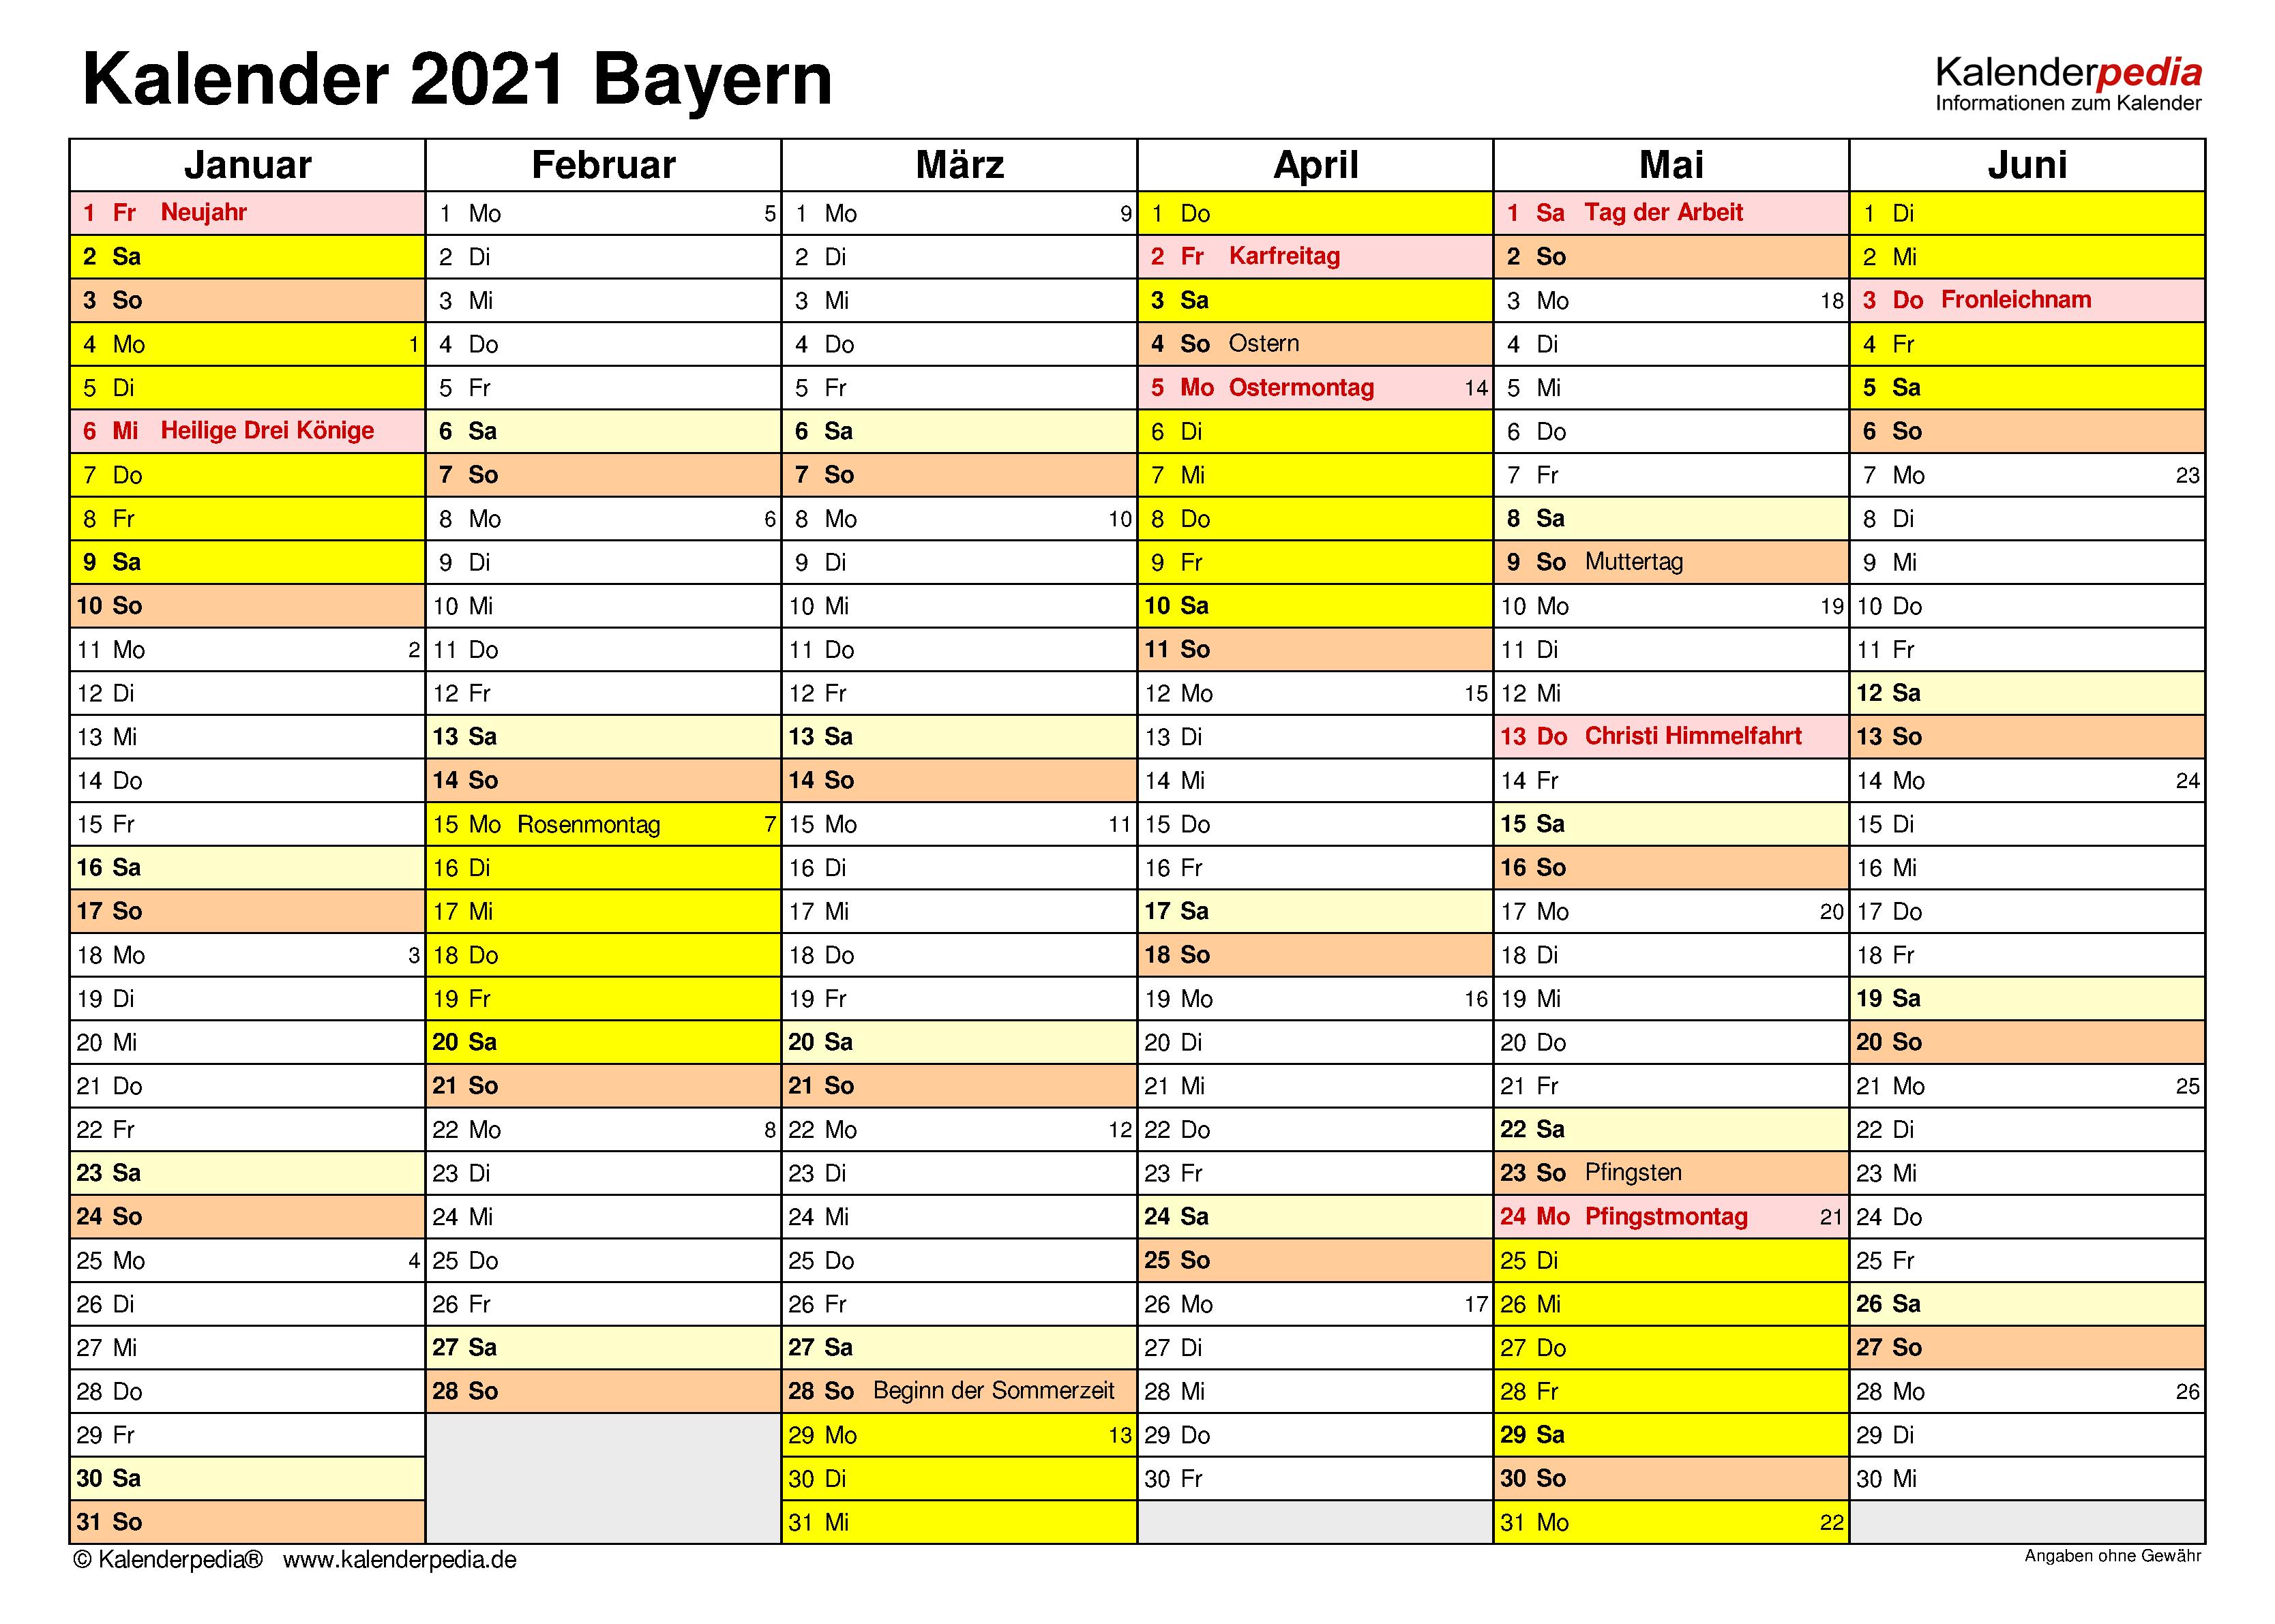 Jungbäuerinnen Kalender 2021 Bayern